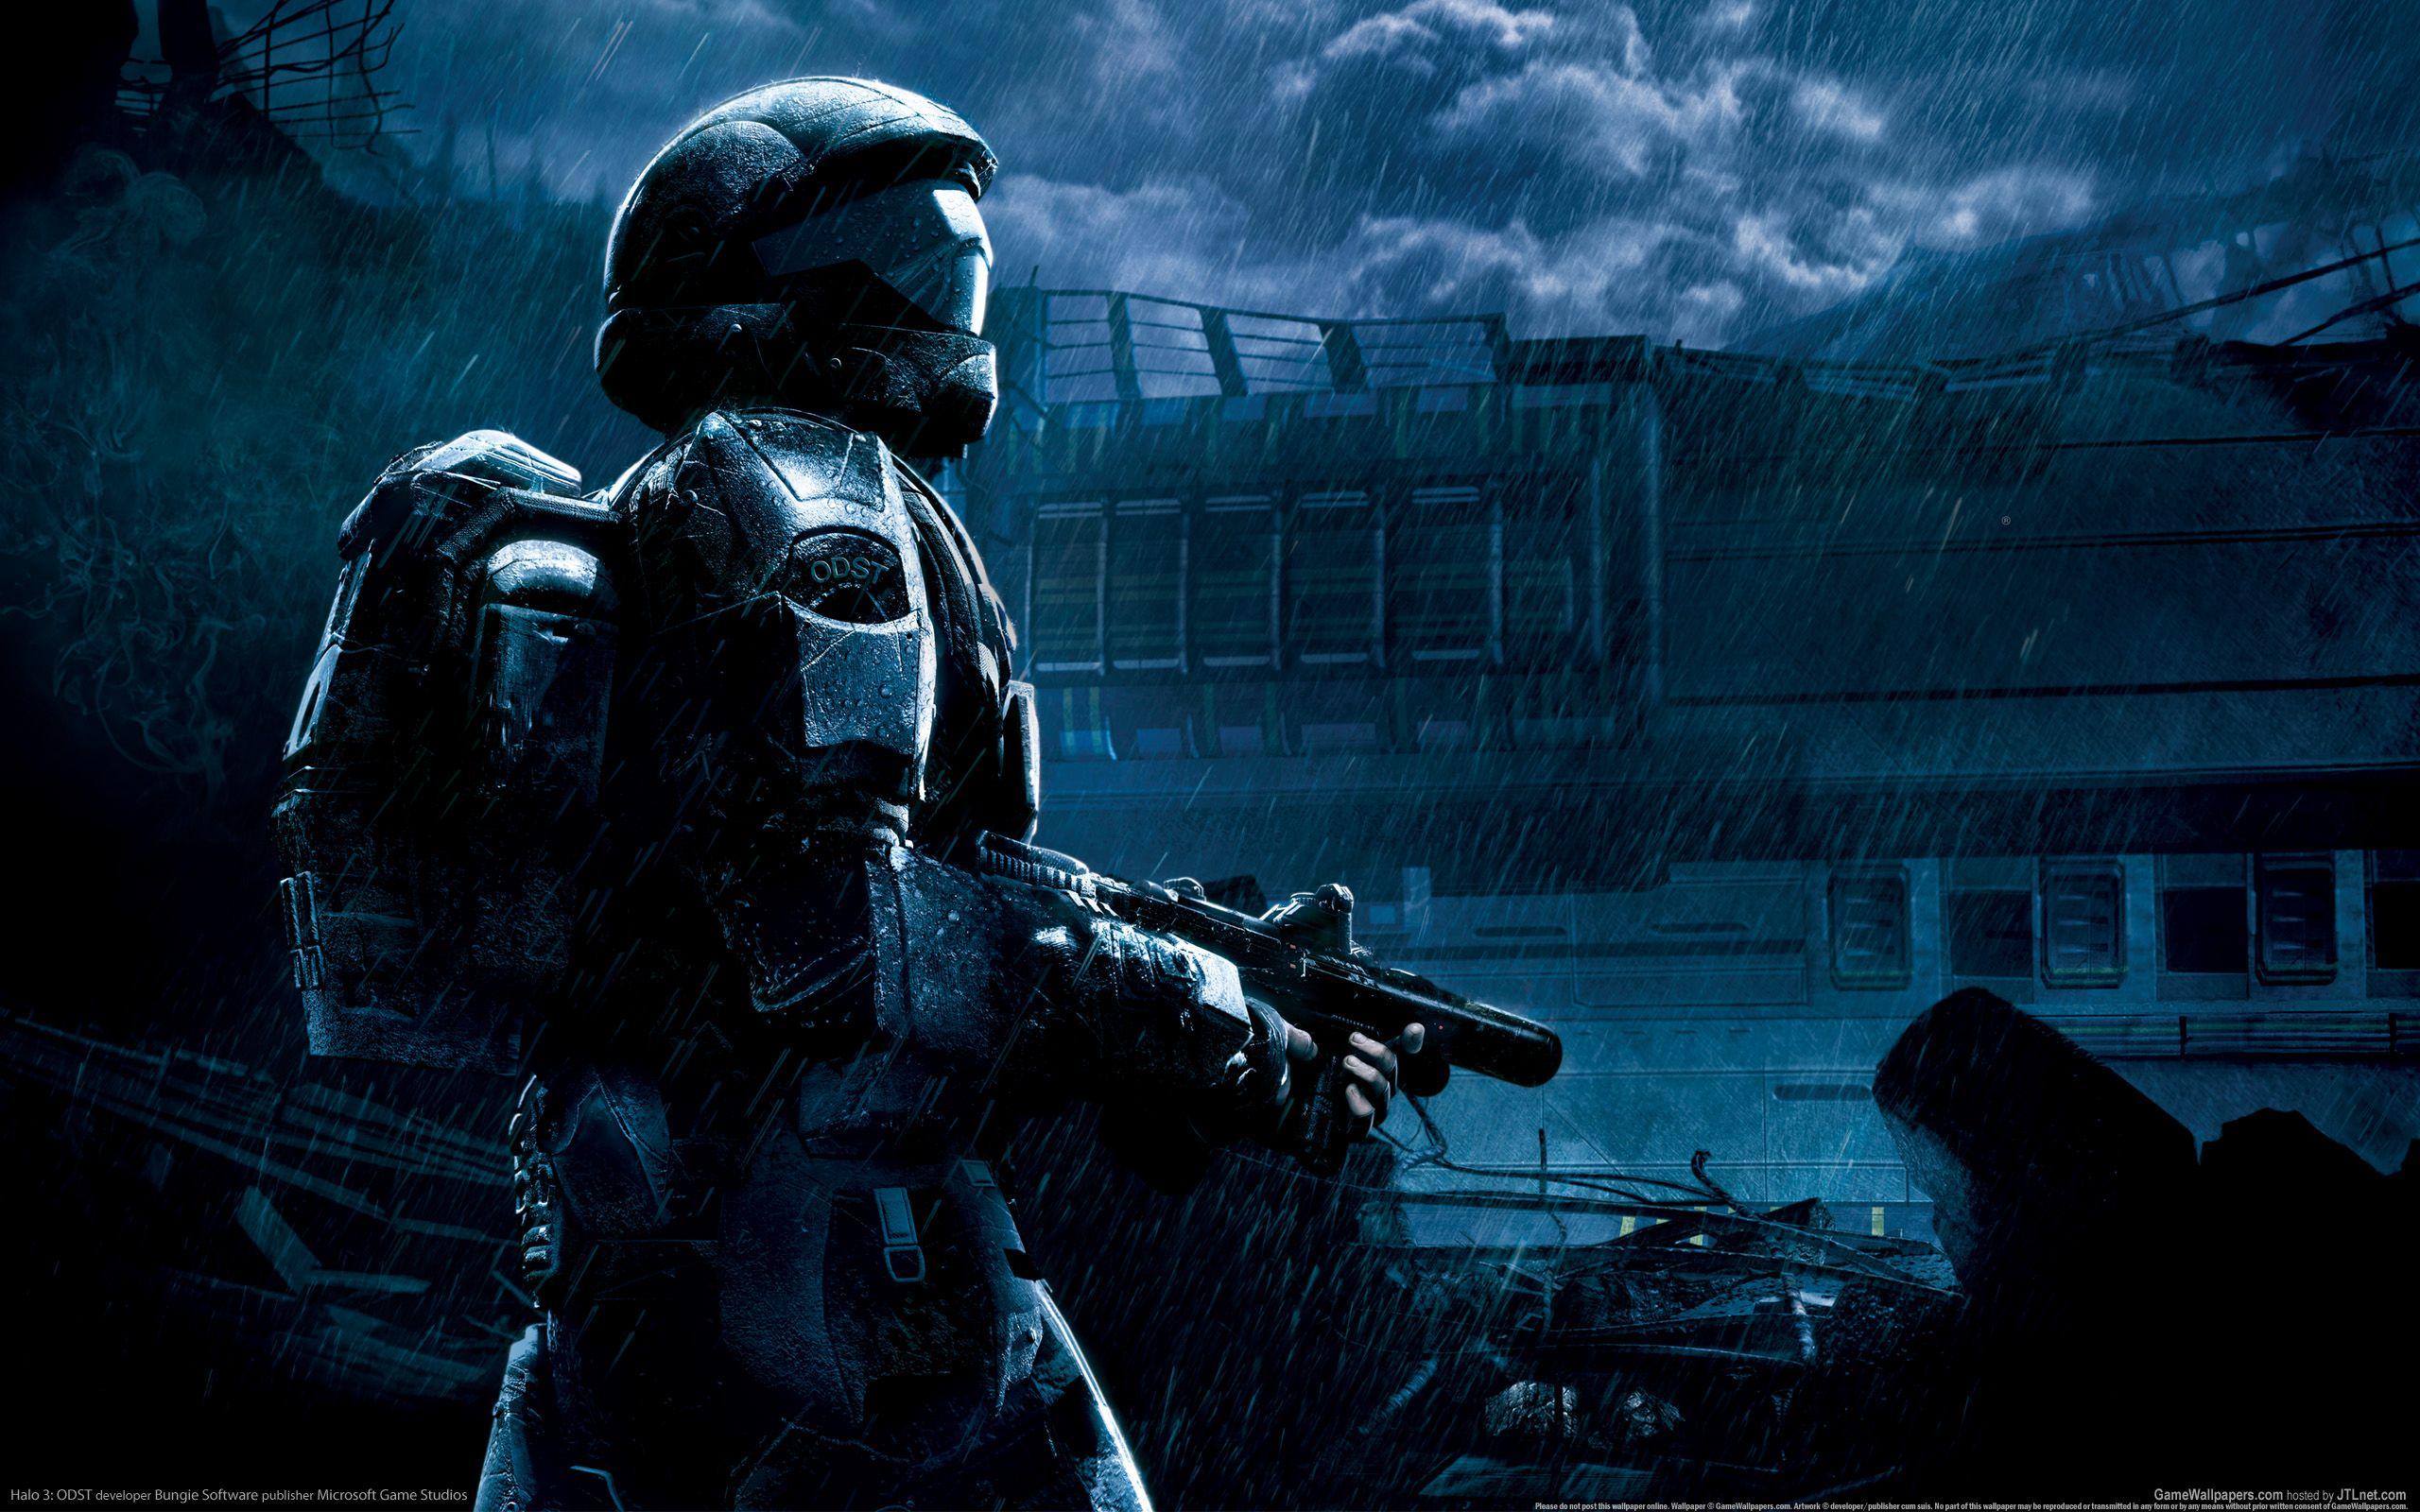 My Completely Random Wallpaper Dump Post Halo 3 Odst Halo 3 Halo Armor